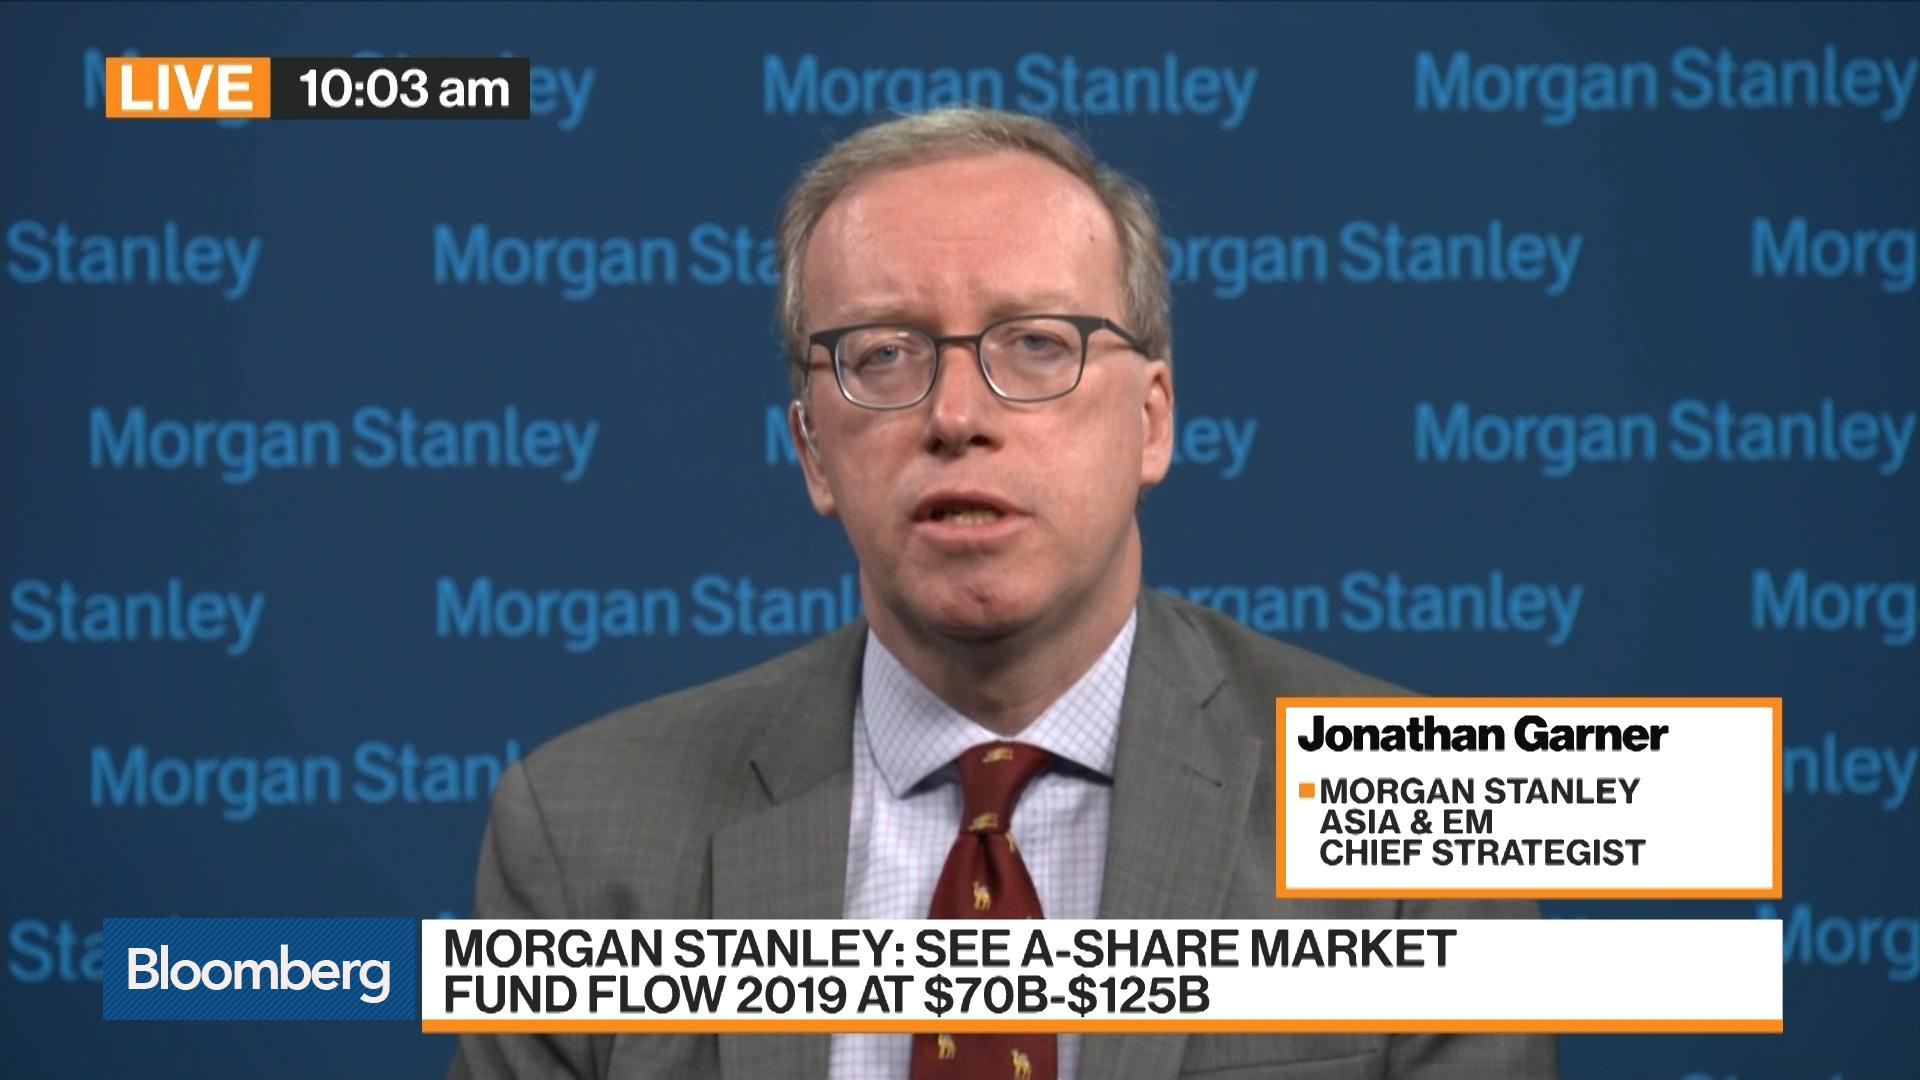 We Remain Bullish on China, Says Morgan Stanley's Garner